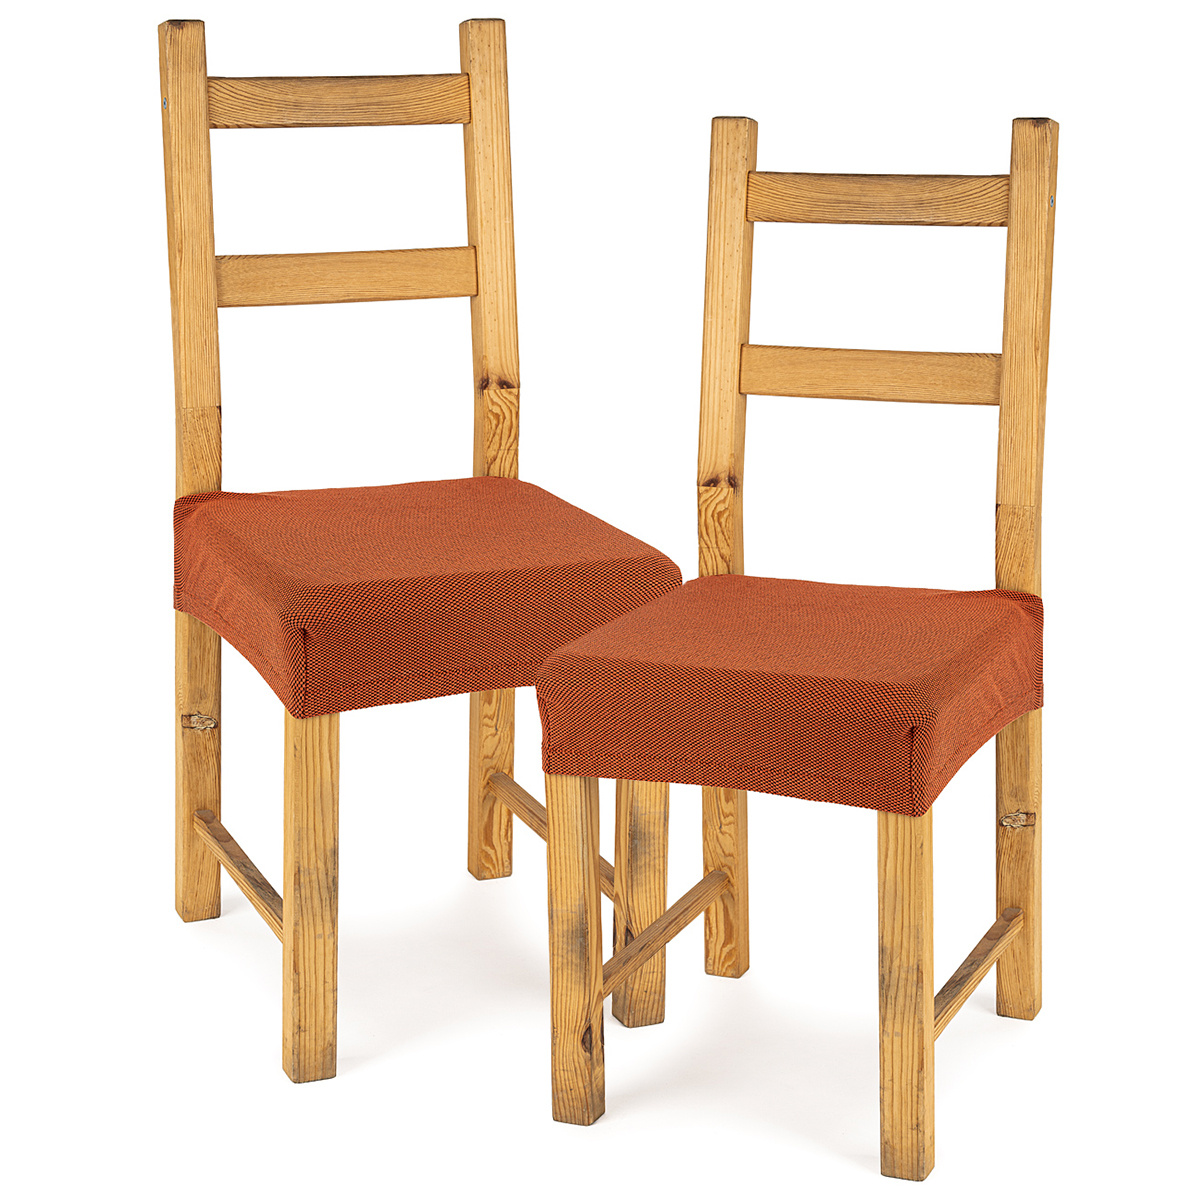 4Home Multielastický potah na sedák na židli Comfort terracotta, 40 - 50 cm, sada 2 ks